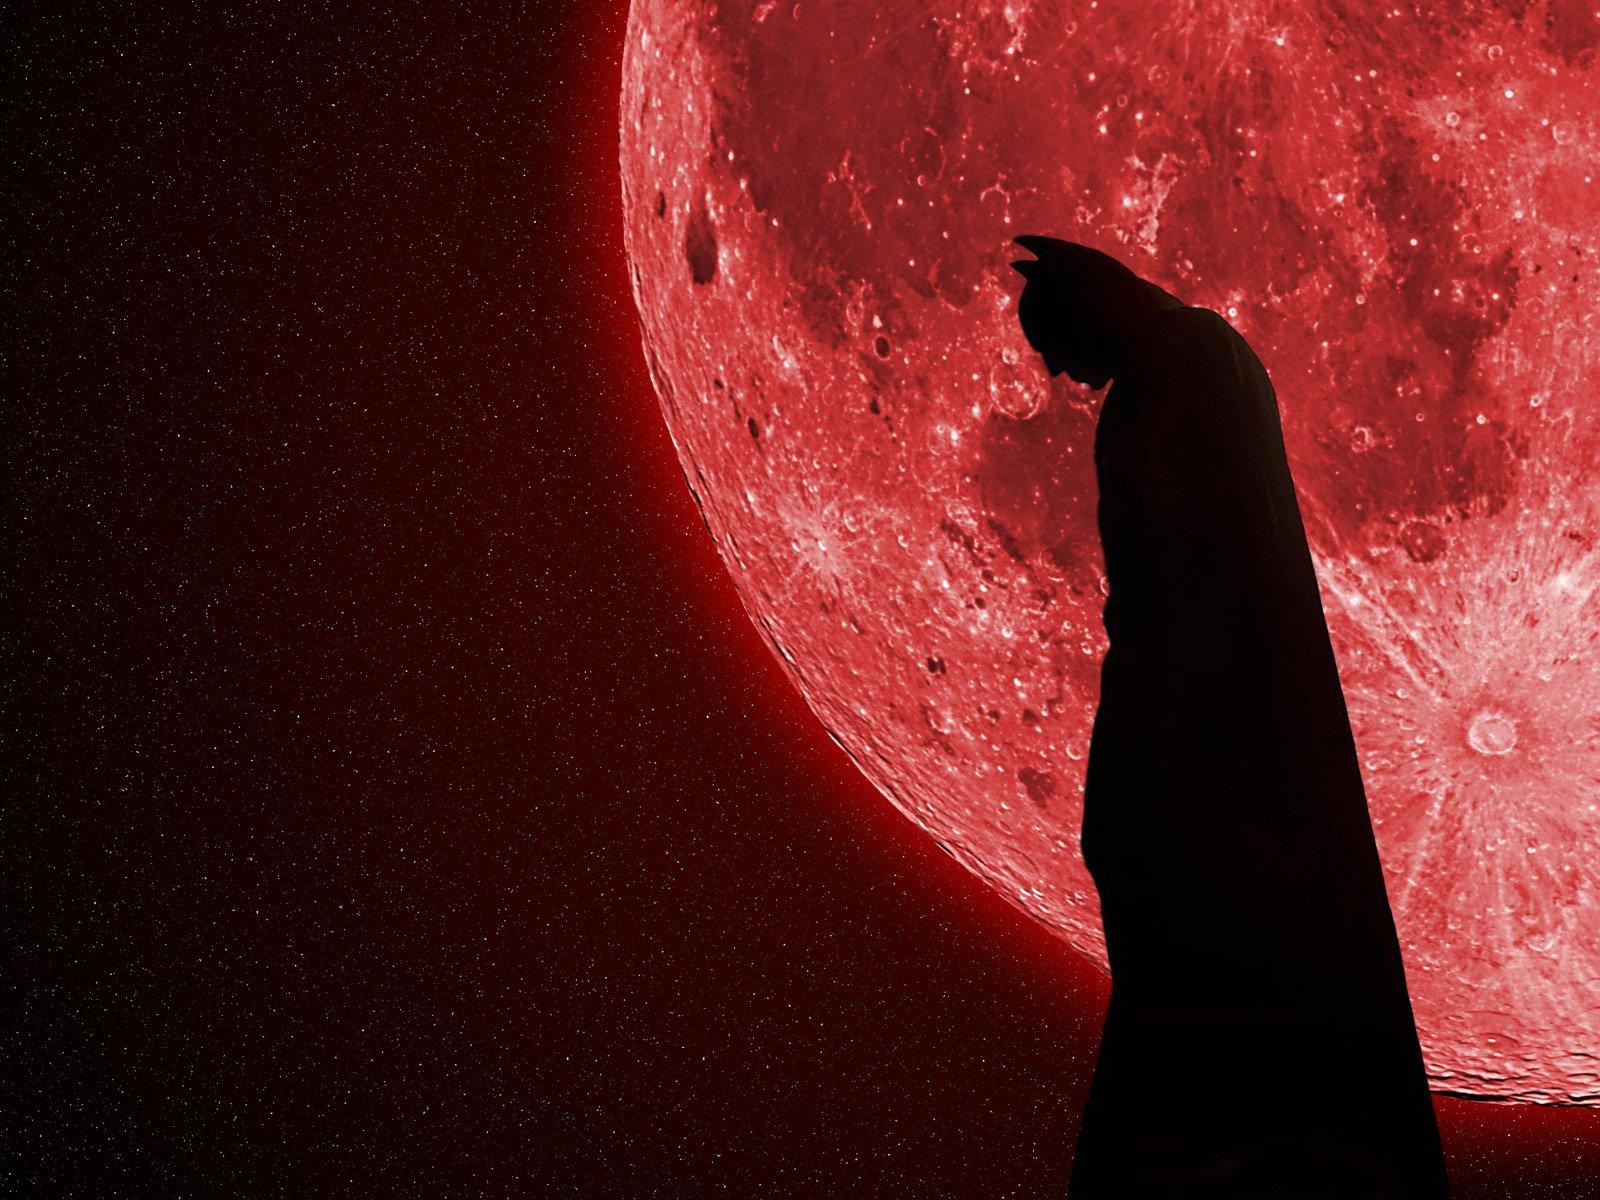 Red Full Moon Wallpaper Red Moon Wallpaper - W...